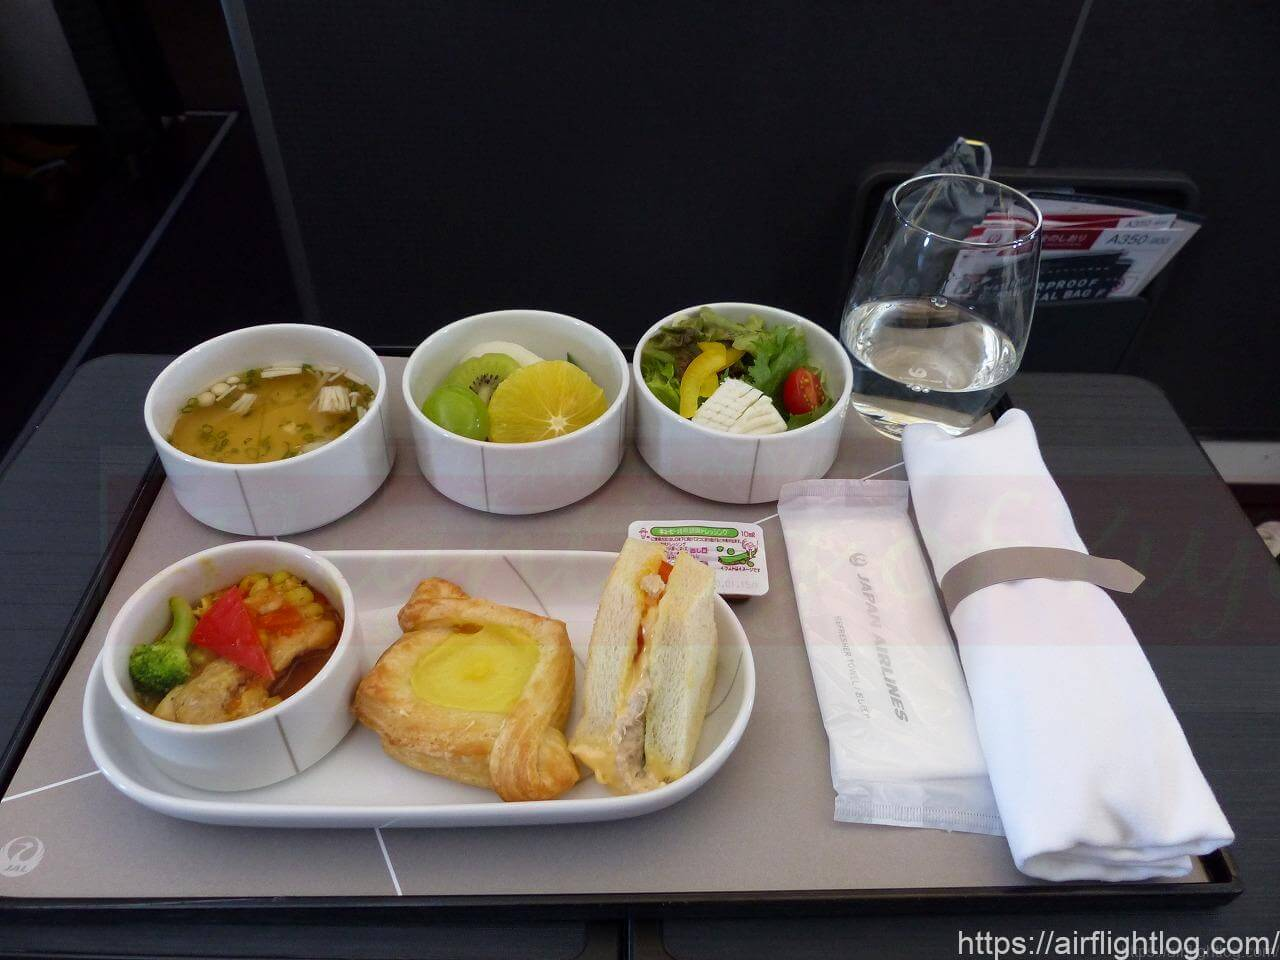 JALA350-900国内線ファーストクラス機内食(朝食)